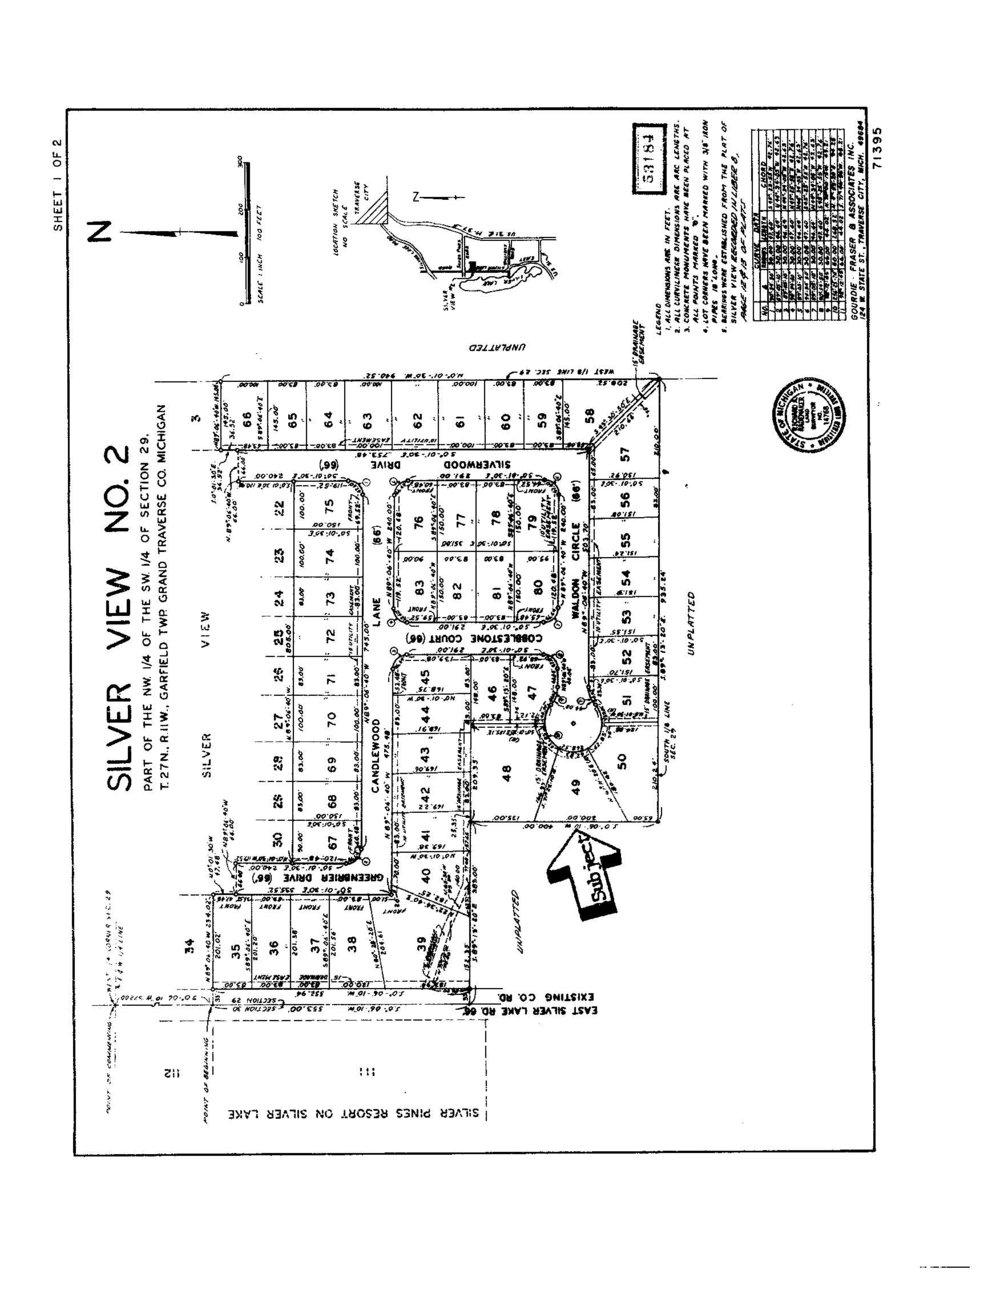 4903 Waldon Circle, Traverse City, MI – 3 Bedroom & 2 Bath Ranch Home for sale by Oltersdorf Realty LLC marketing packet (8).jpg